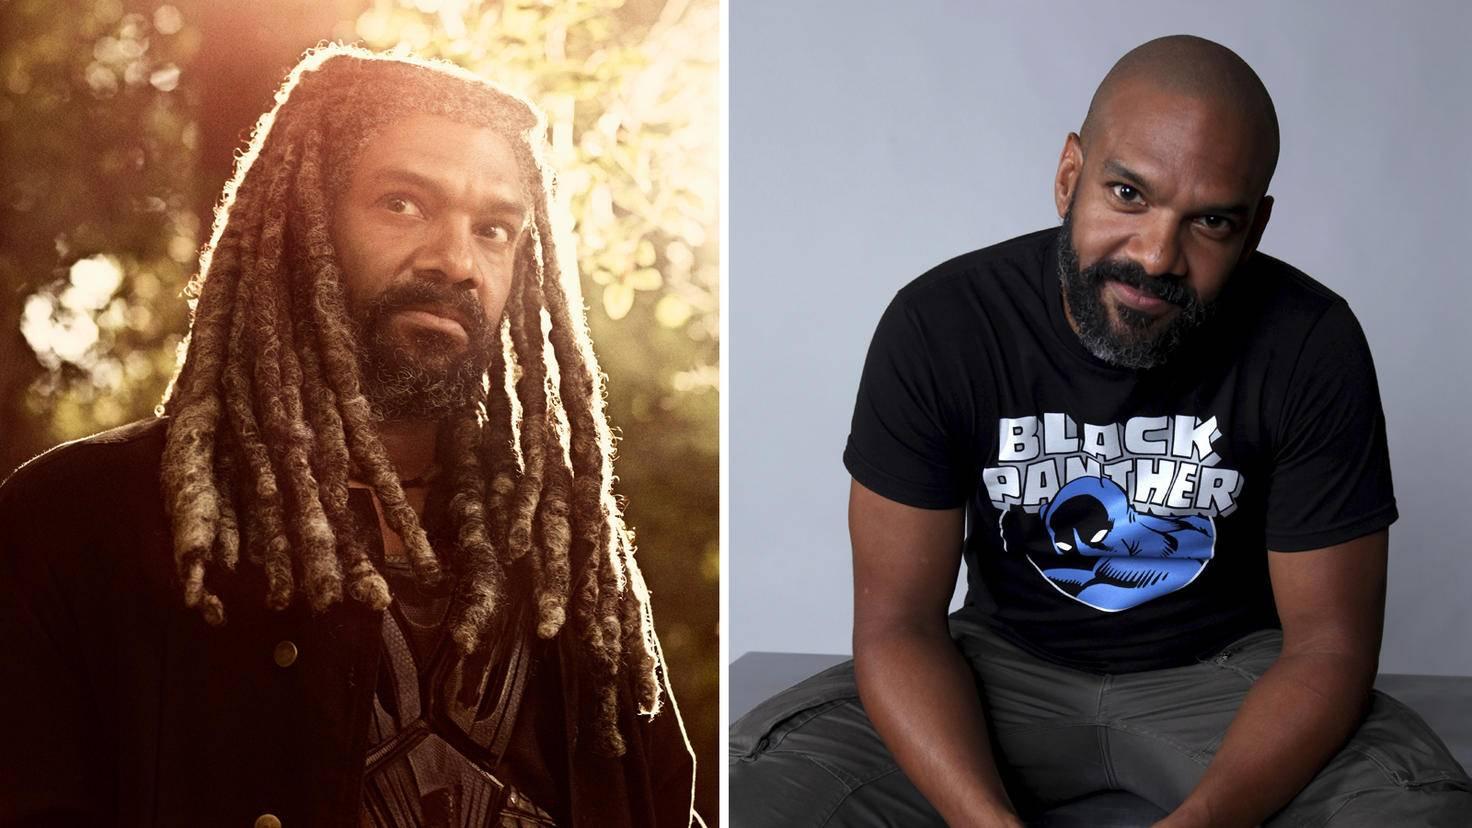 The Walking Dead-S09-Ezekiel-Victoria Will-AMC-Khary Payton-picture alliance AP Photo-106736071